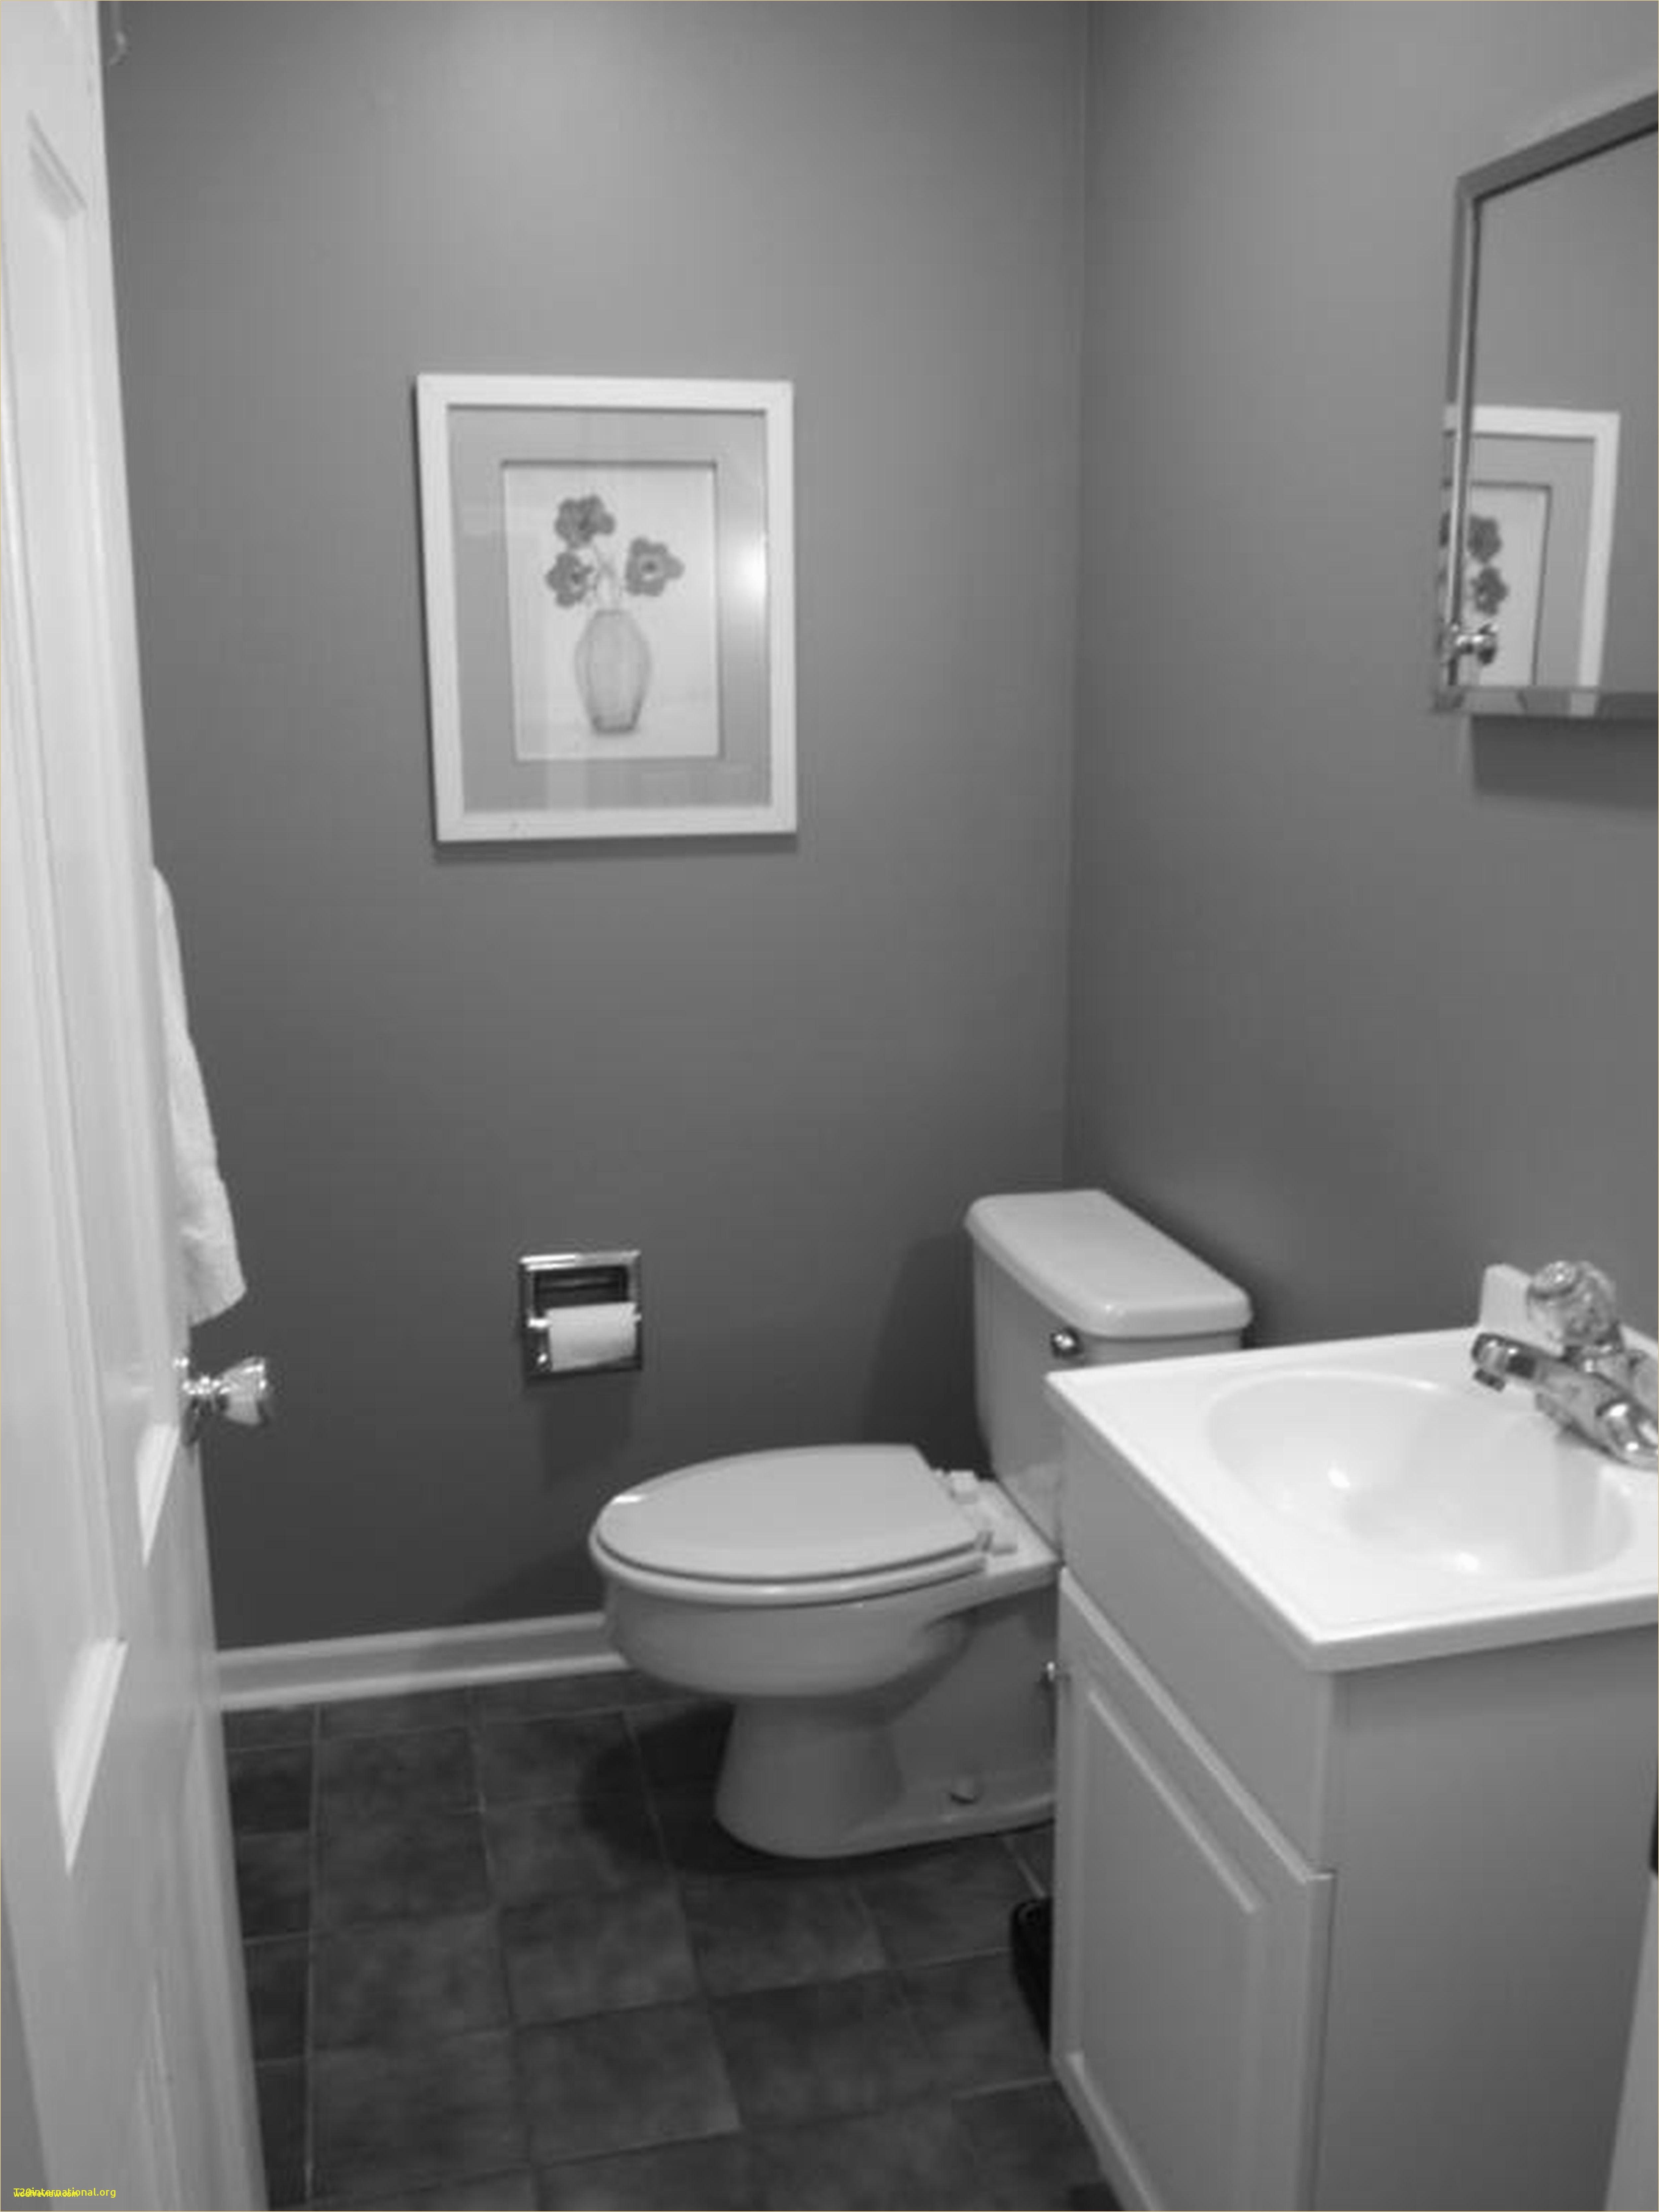 Modern Decoration for Home Outdoor Bathroom Ideas Best Grey Bathroom 0d Archives Modern Design